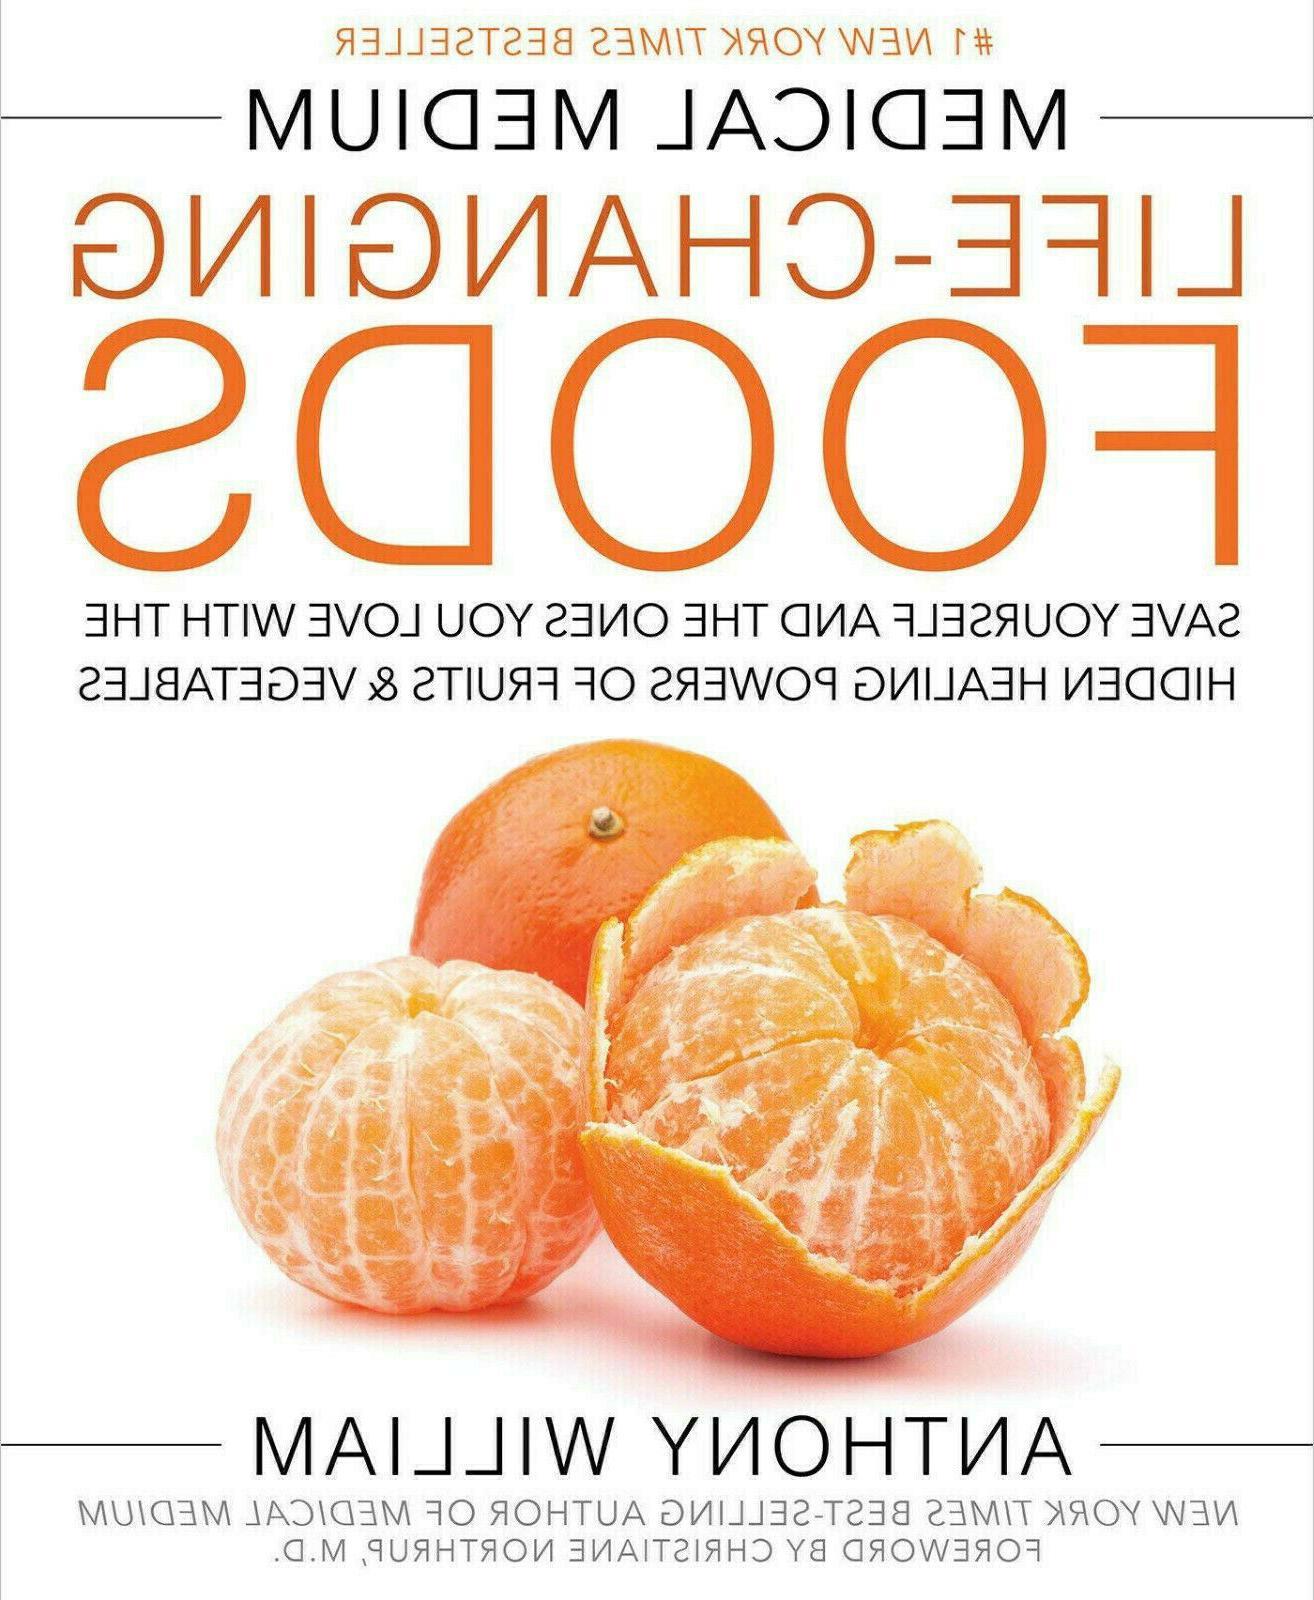 All Medical Medium Liver Thyroid Celery ᴇ-books